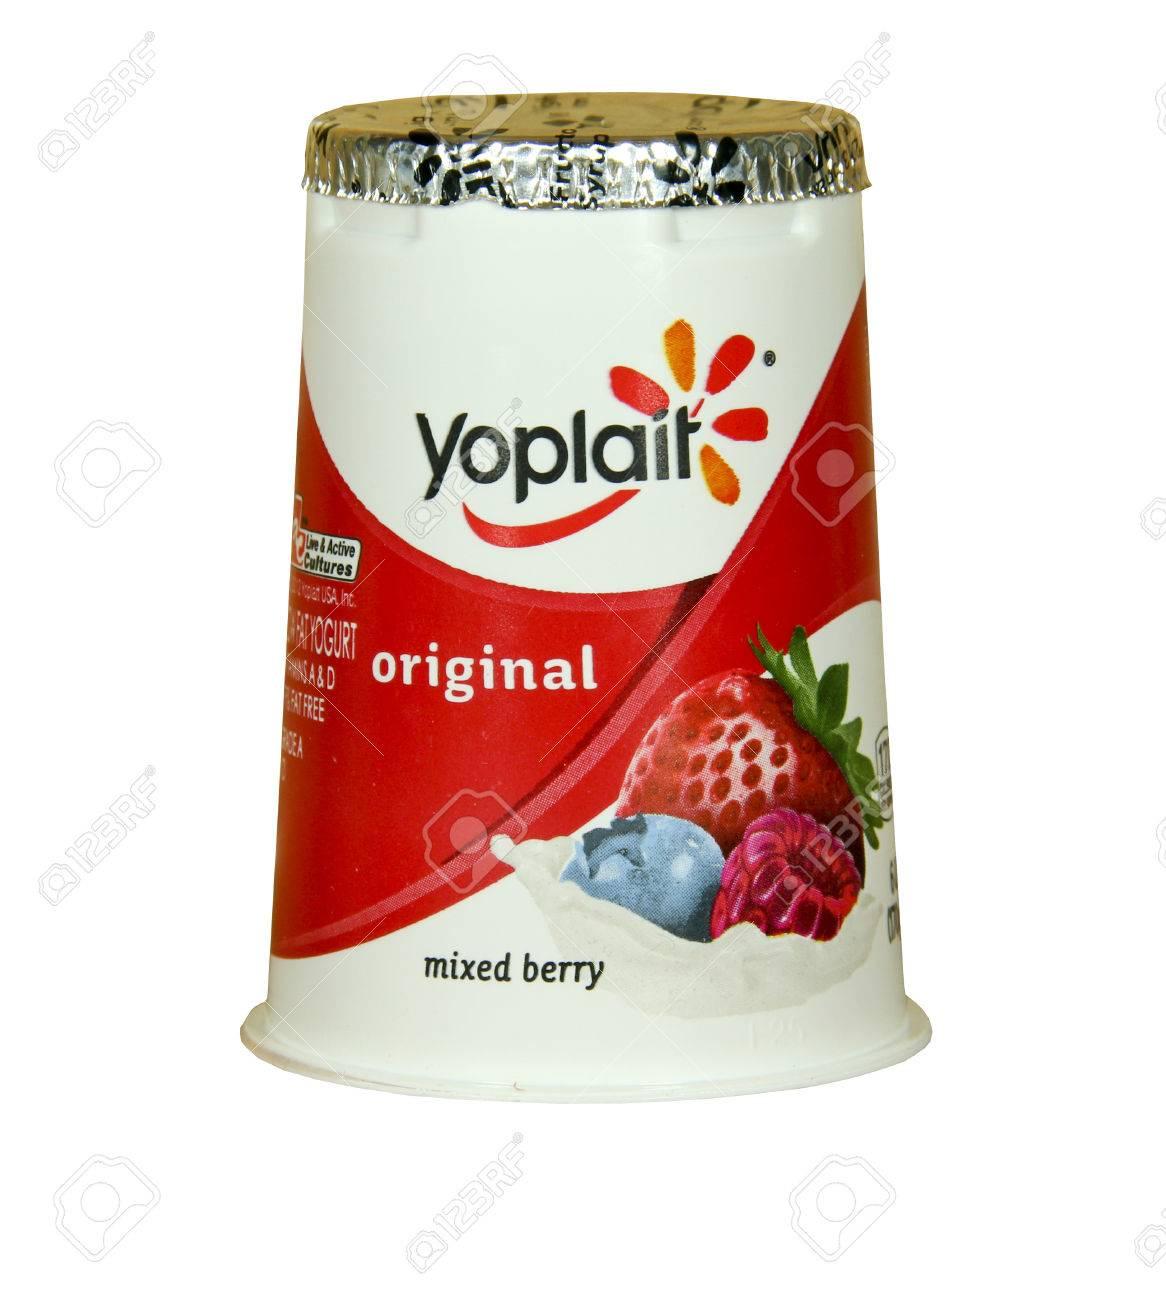 SPENCER , WISCONSIN-APRIL 17, 2014 : Yoplait Mixed Berry Yogurt. Yoplait is